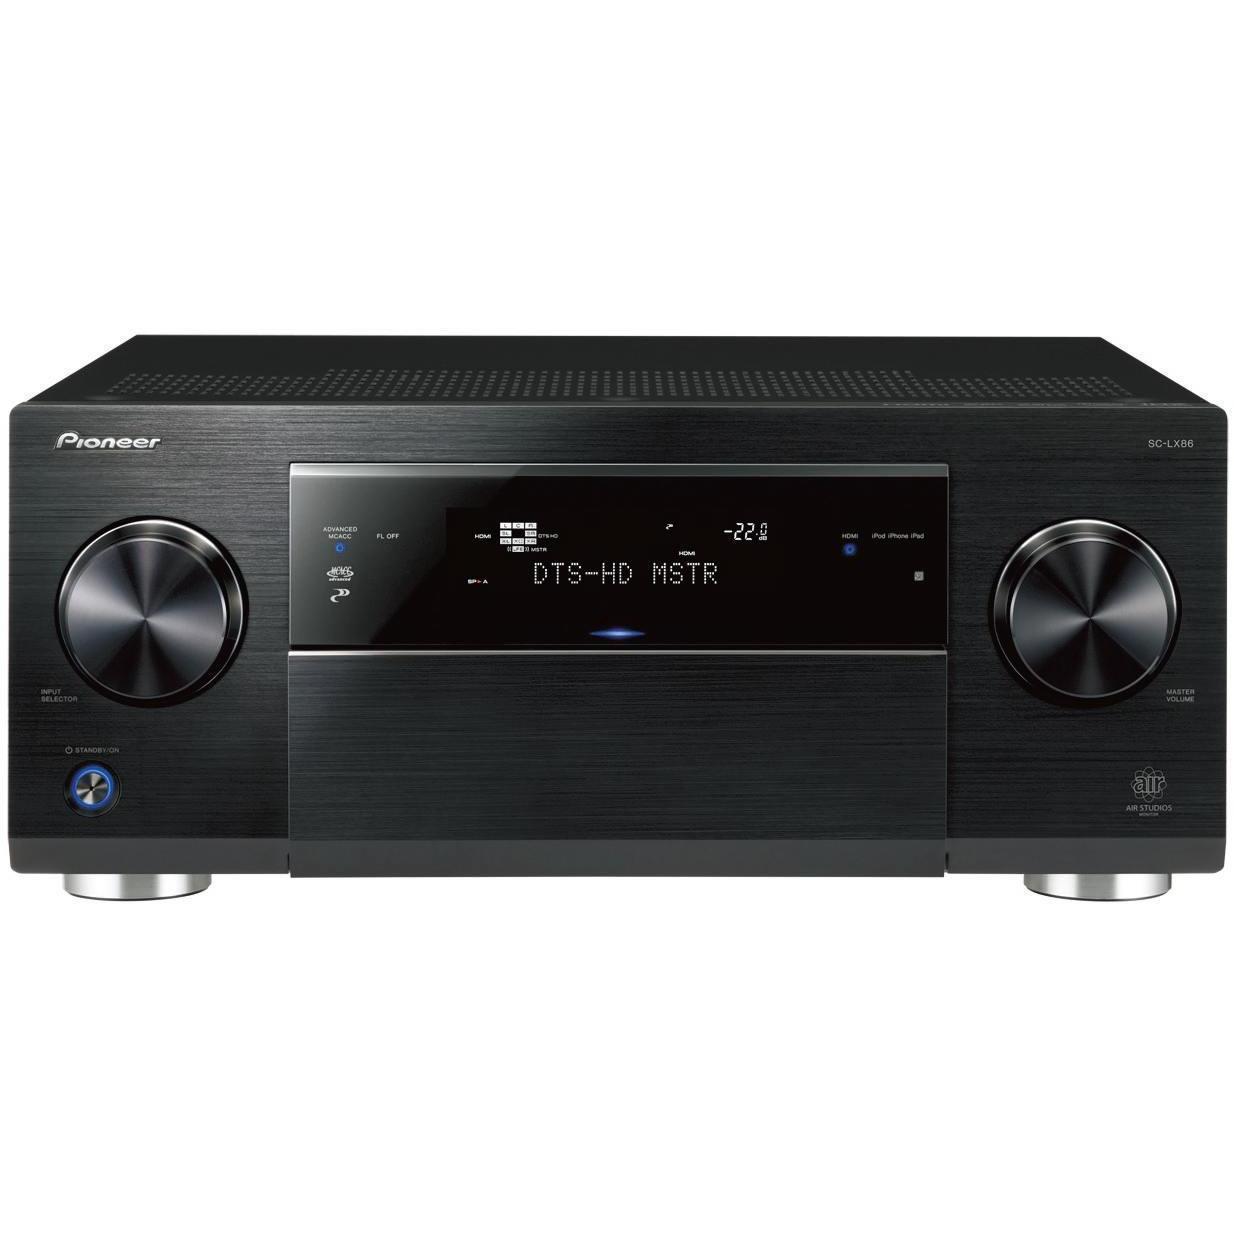 Amplificateur Audio-Vidéo PIONEER Amplificateur - Pioneer - SC-LX86